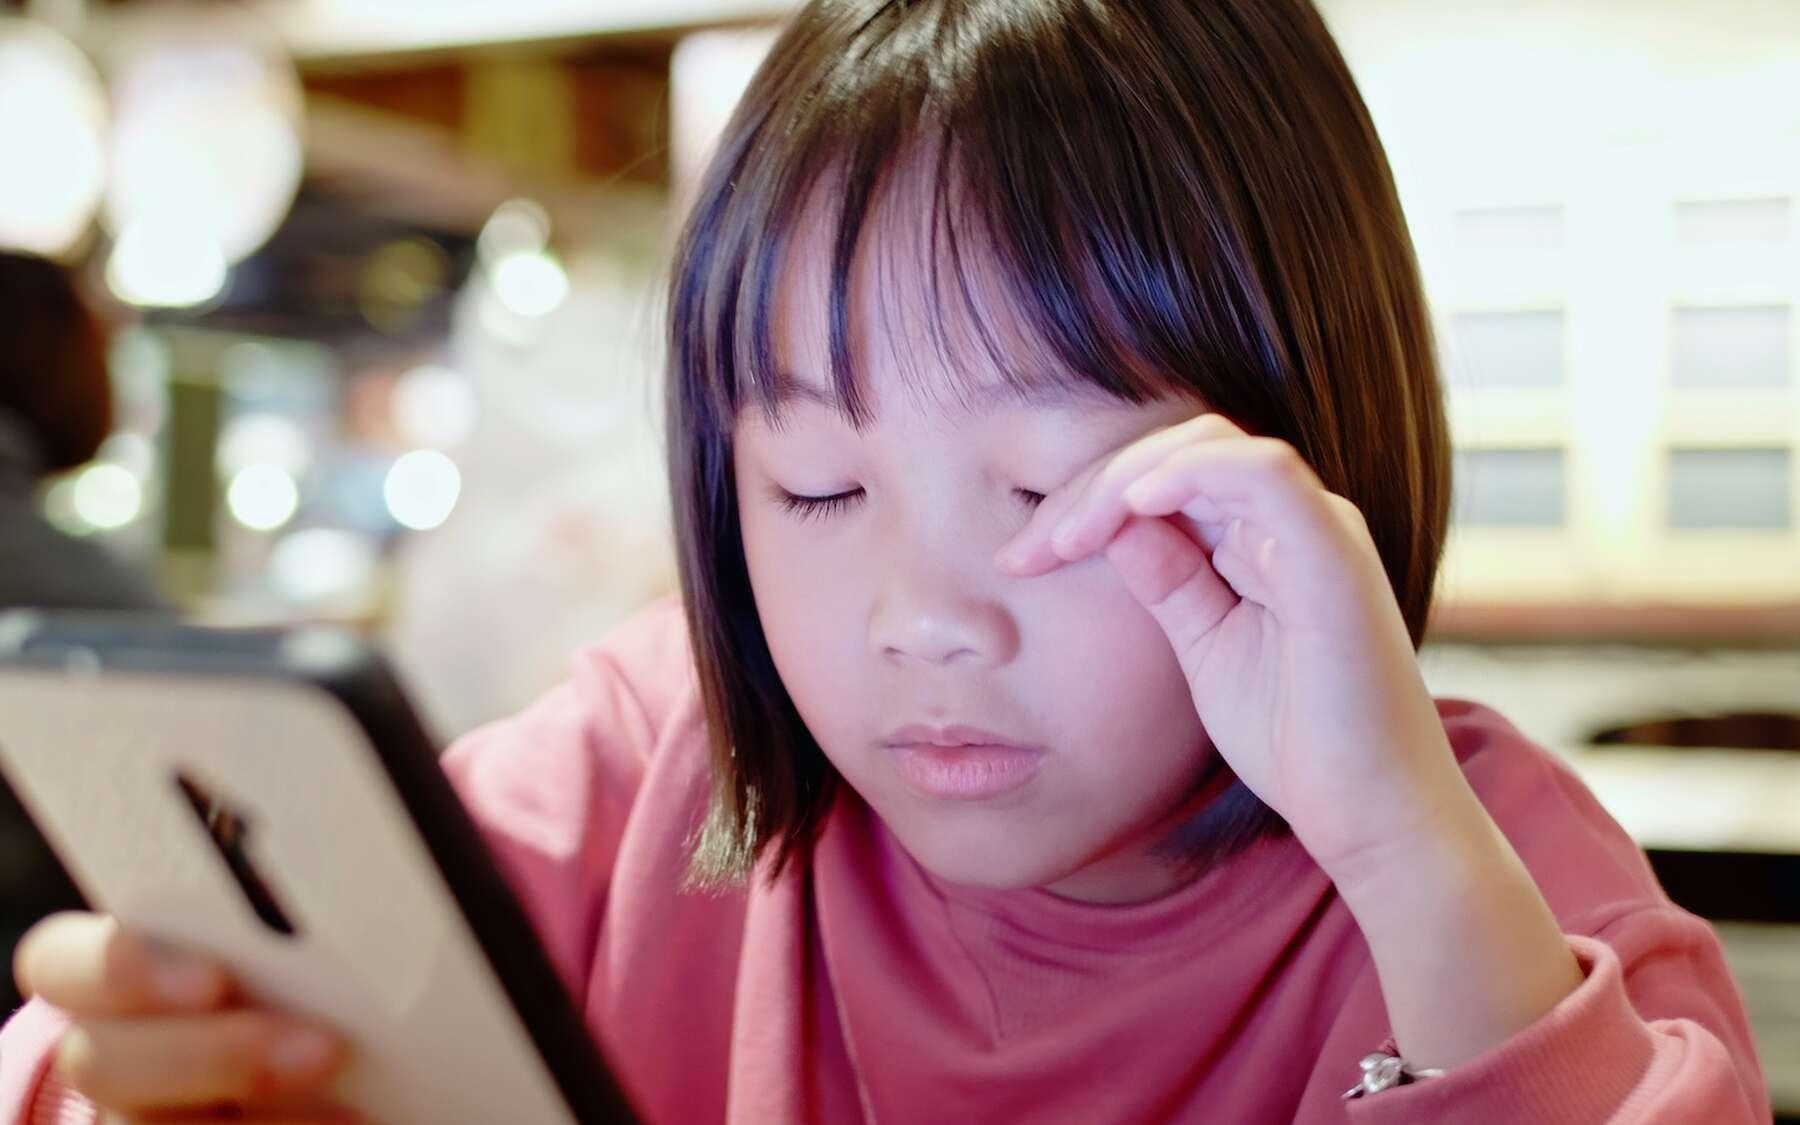 Le manque de sommeil favorise la myopie. © ryanking999, Adobe Stock